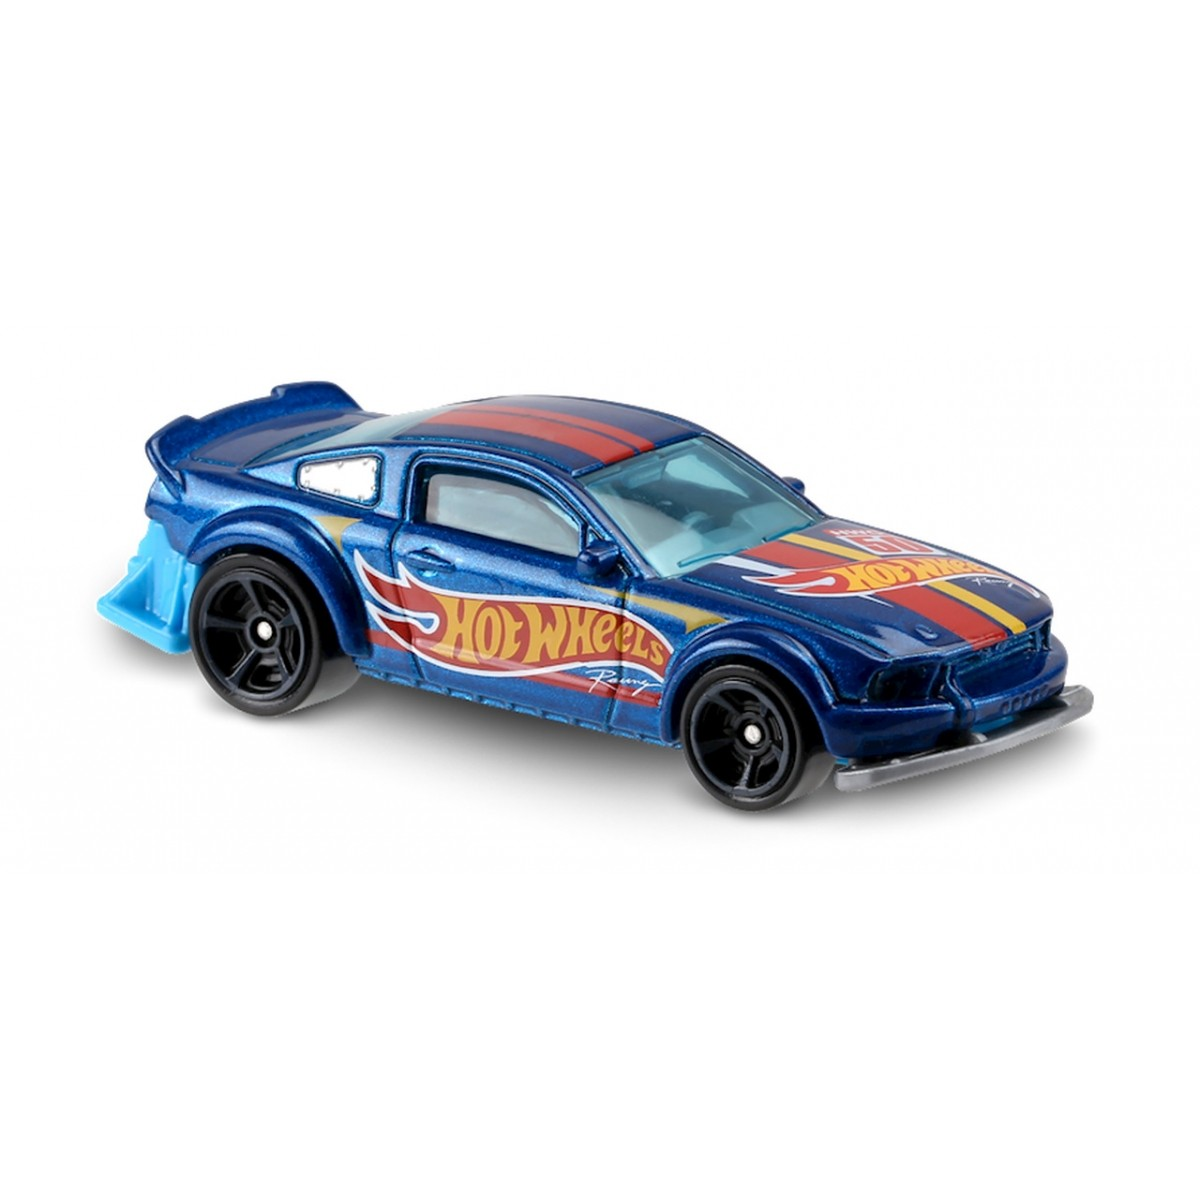 Carrinho Hot Wheels: 2005 Ford Mustang Azul